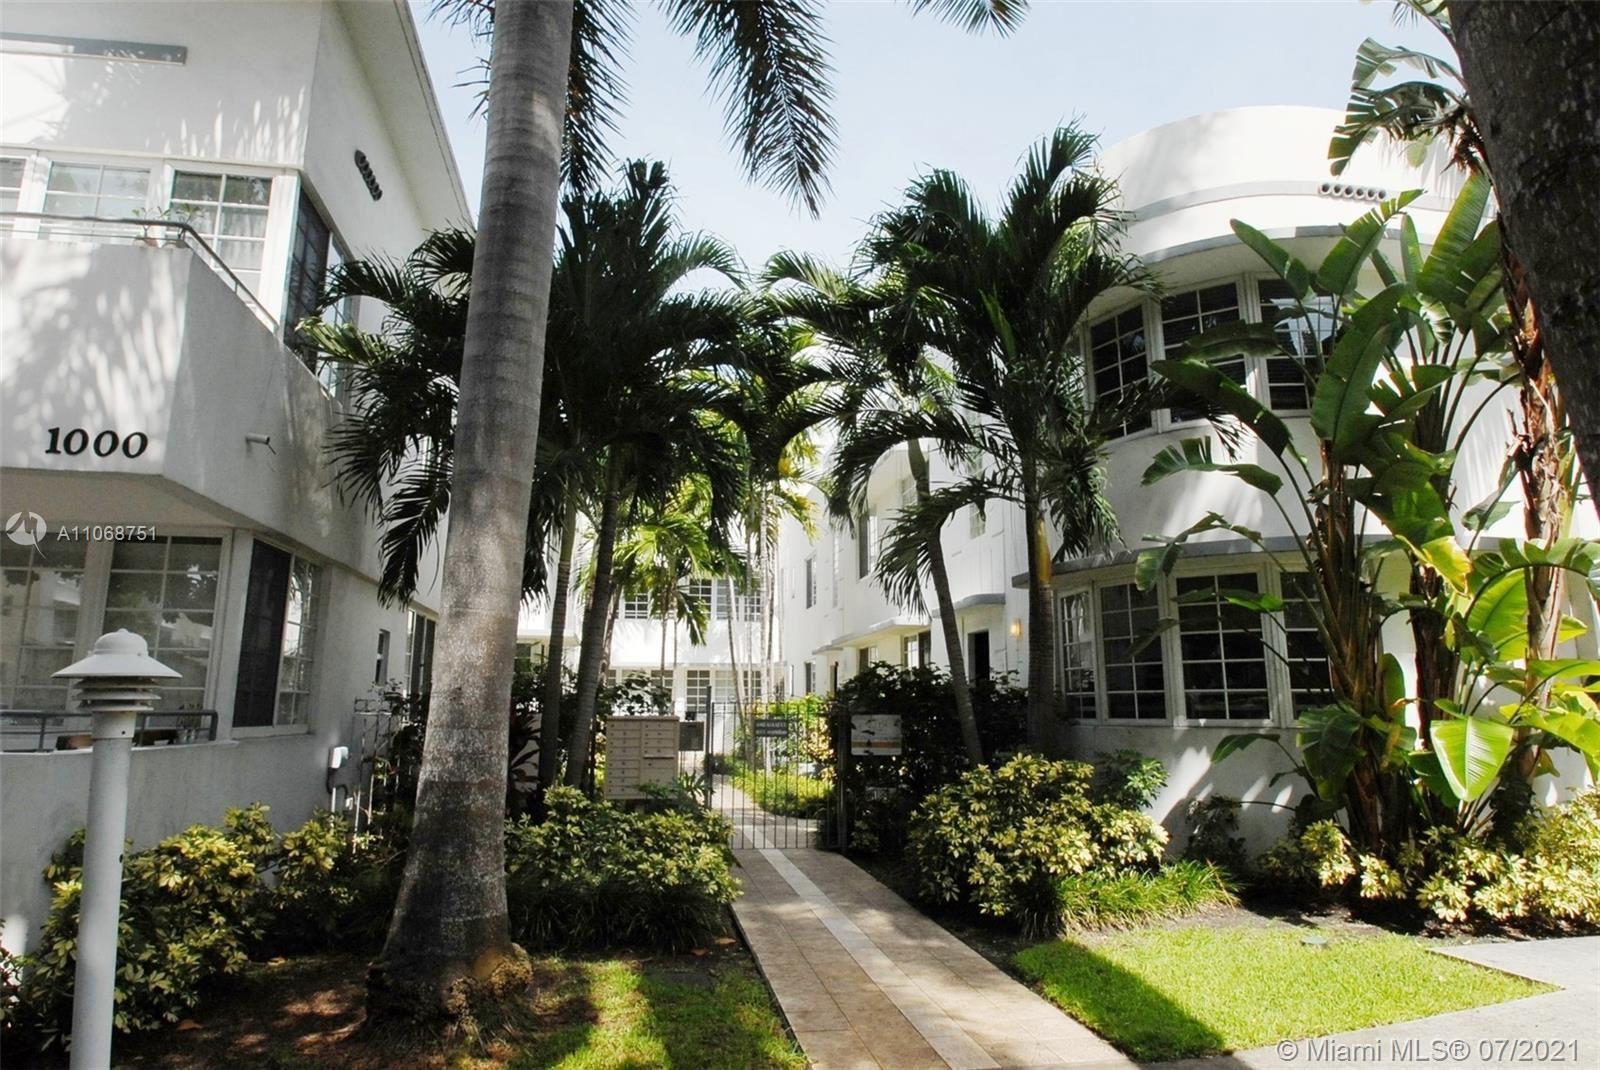 1000 Meridian Ave #23, Miami Beach, FL 33139 - #: A11068751